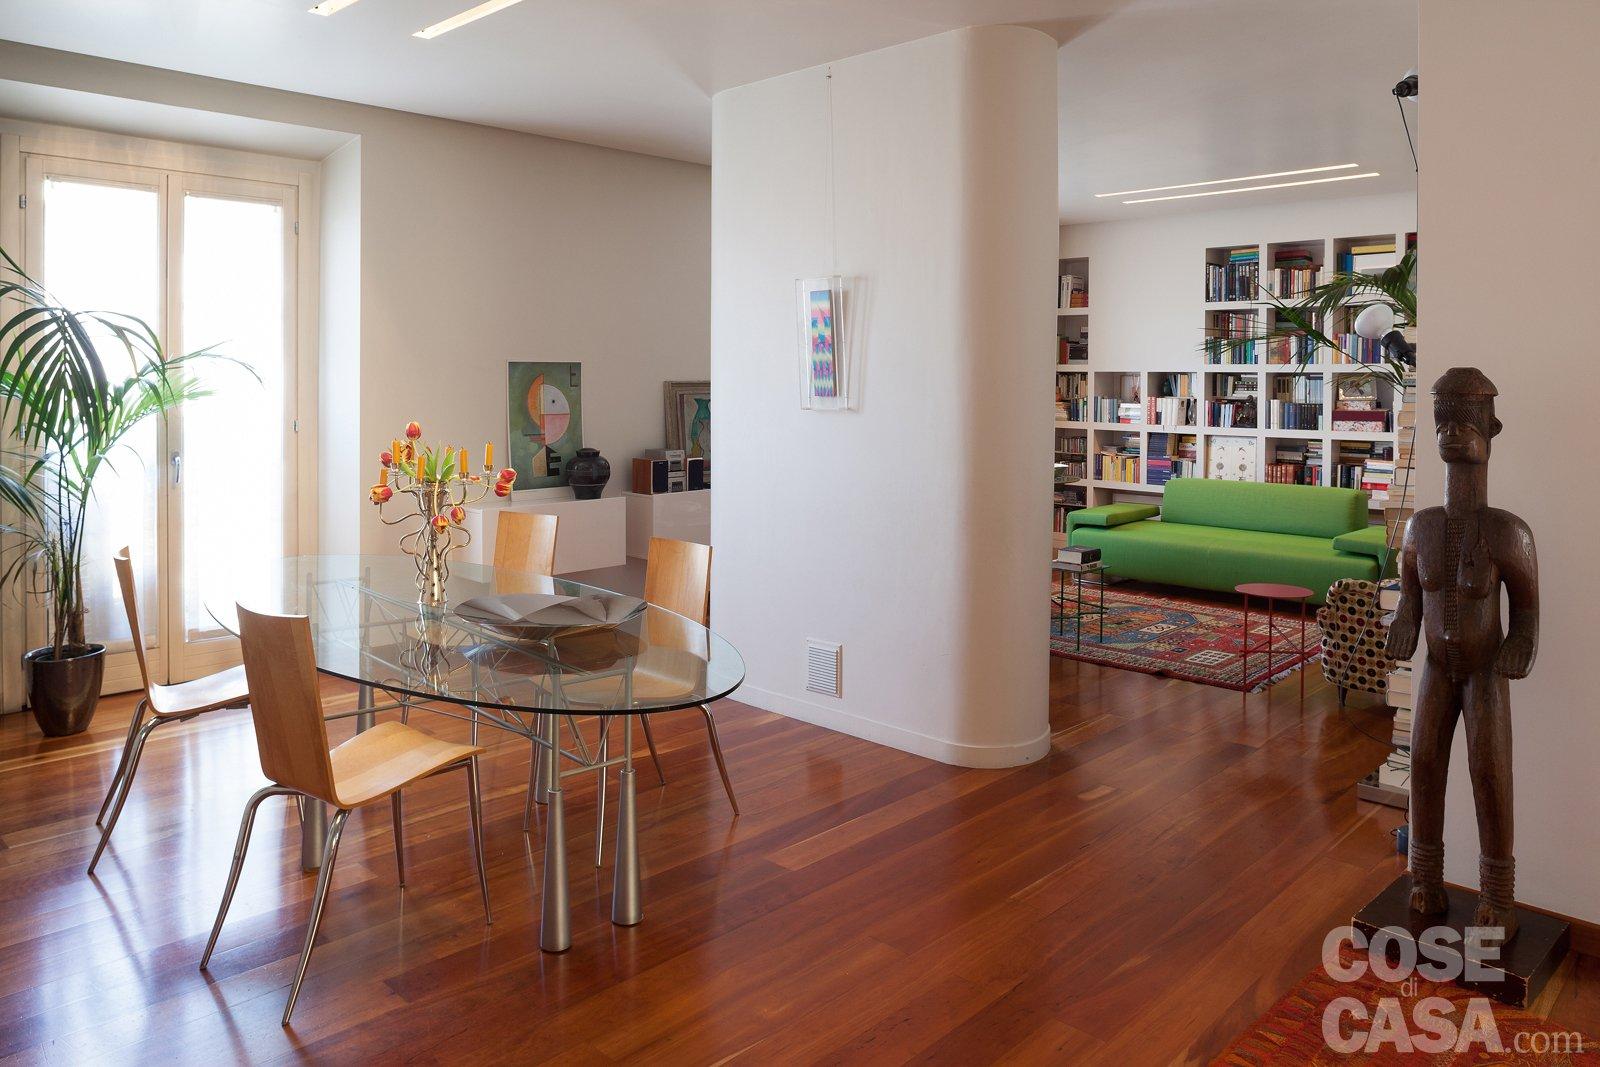 Arredamento moderno in casa d epoca b arredamenti for Arredamento d epoca